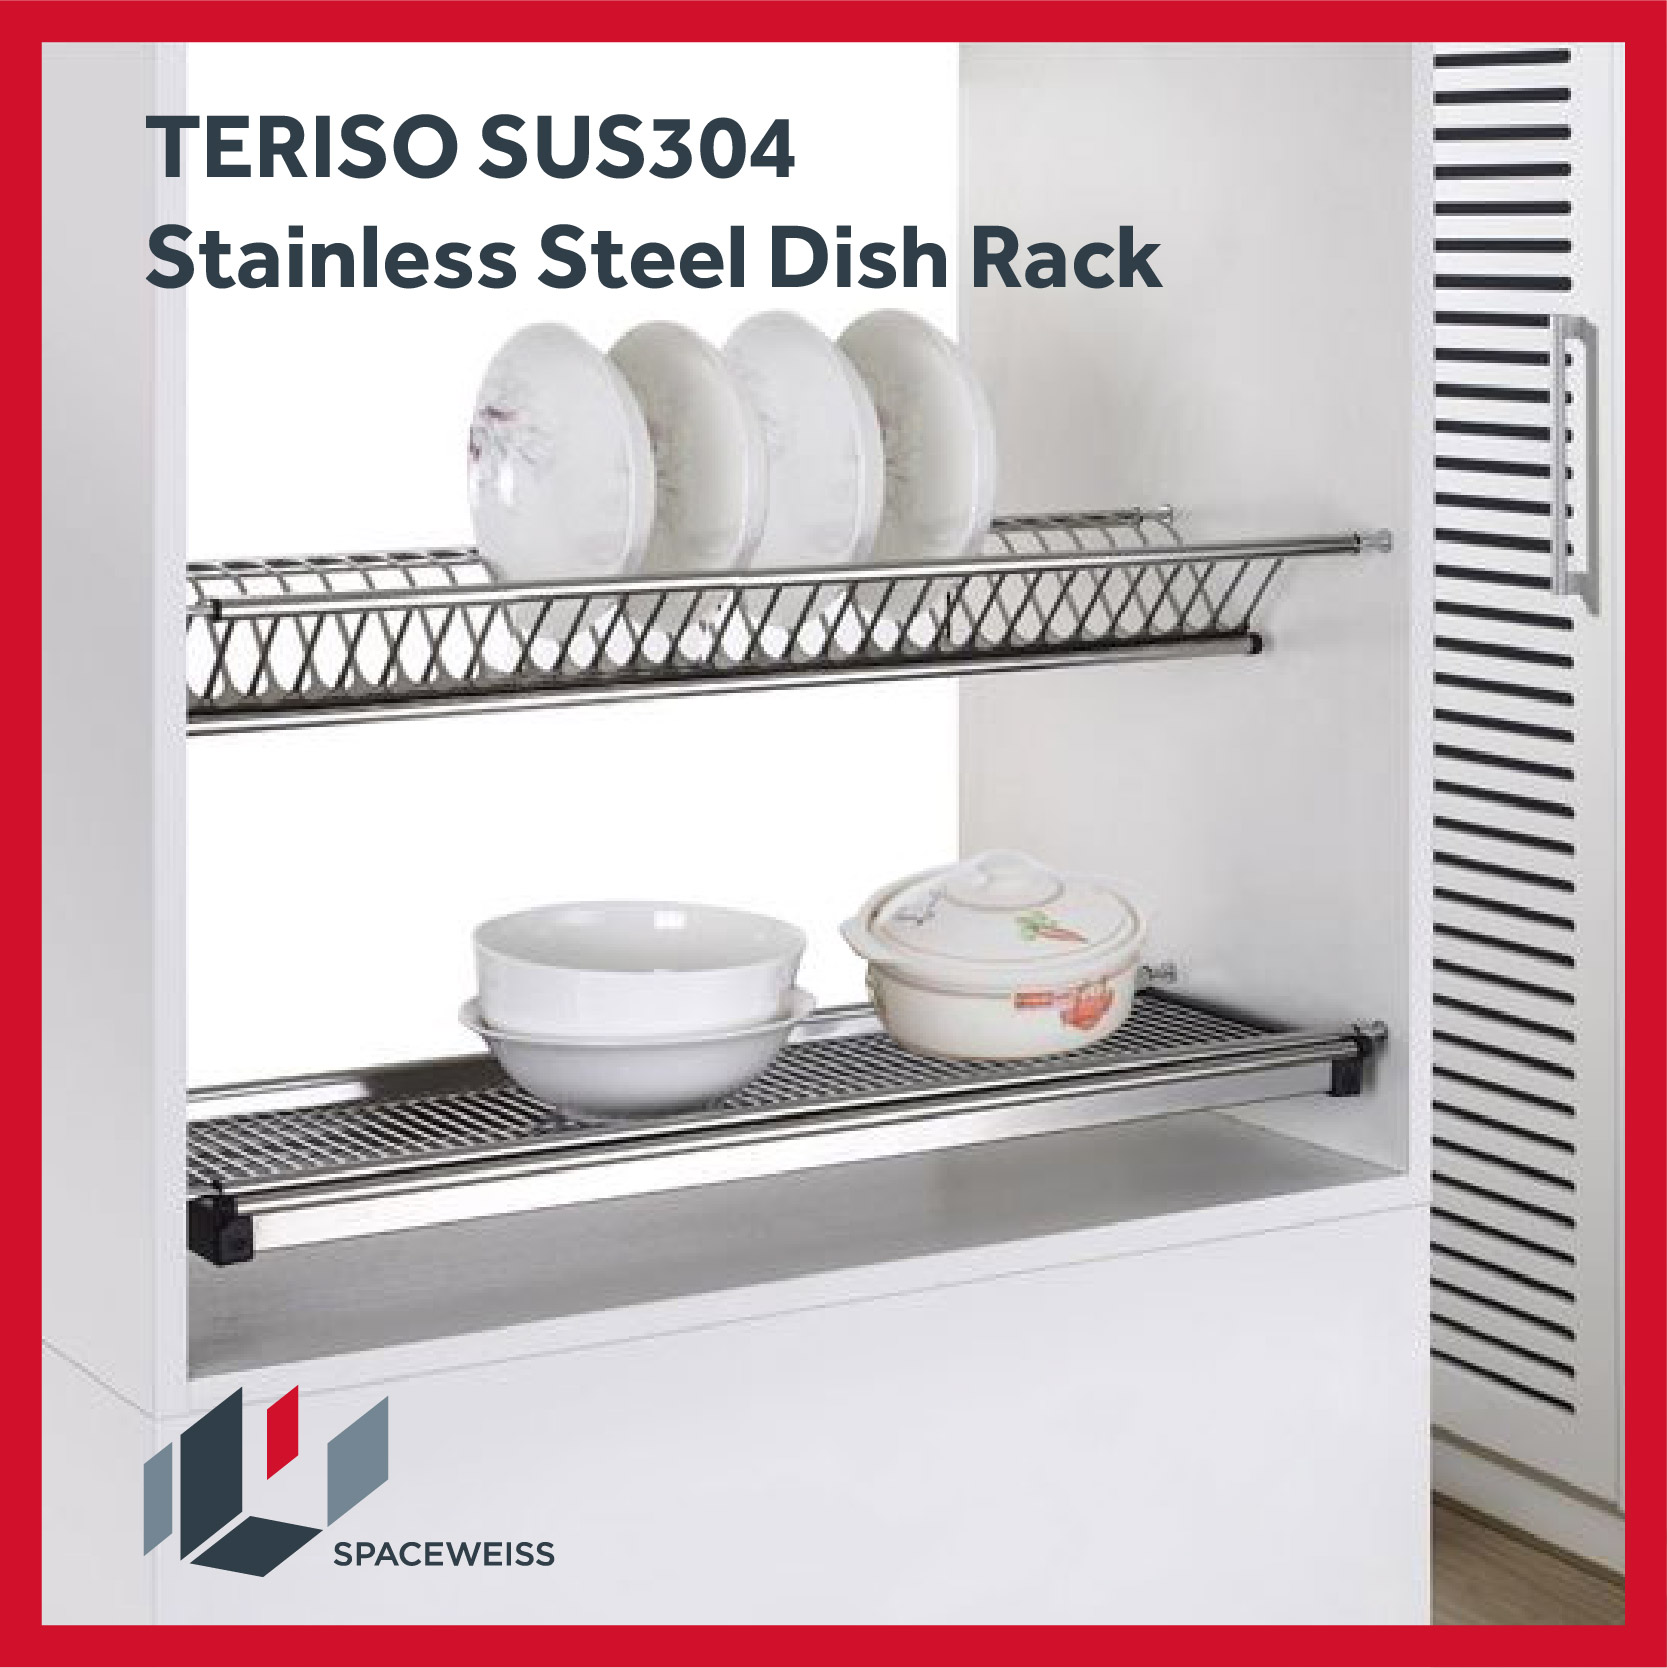 Teriso Sus304 Stainless Steel Dish Rack Spaceweiss Lazada Singapore